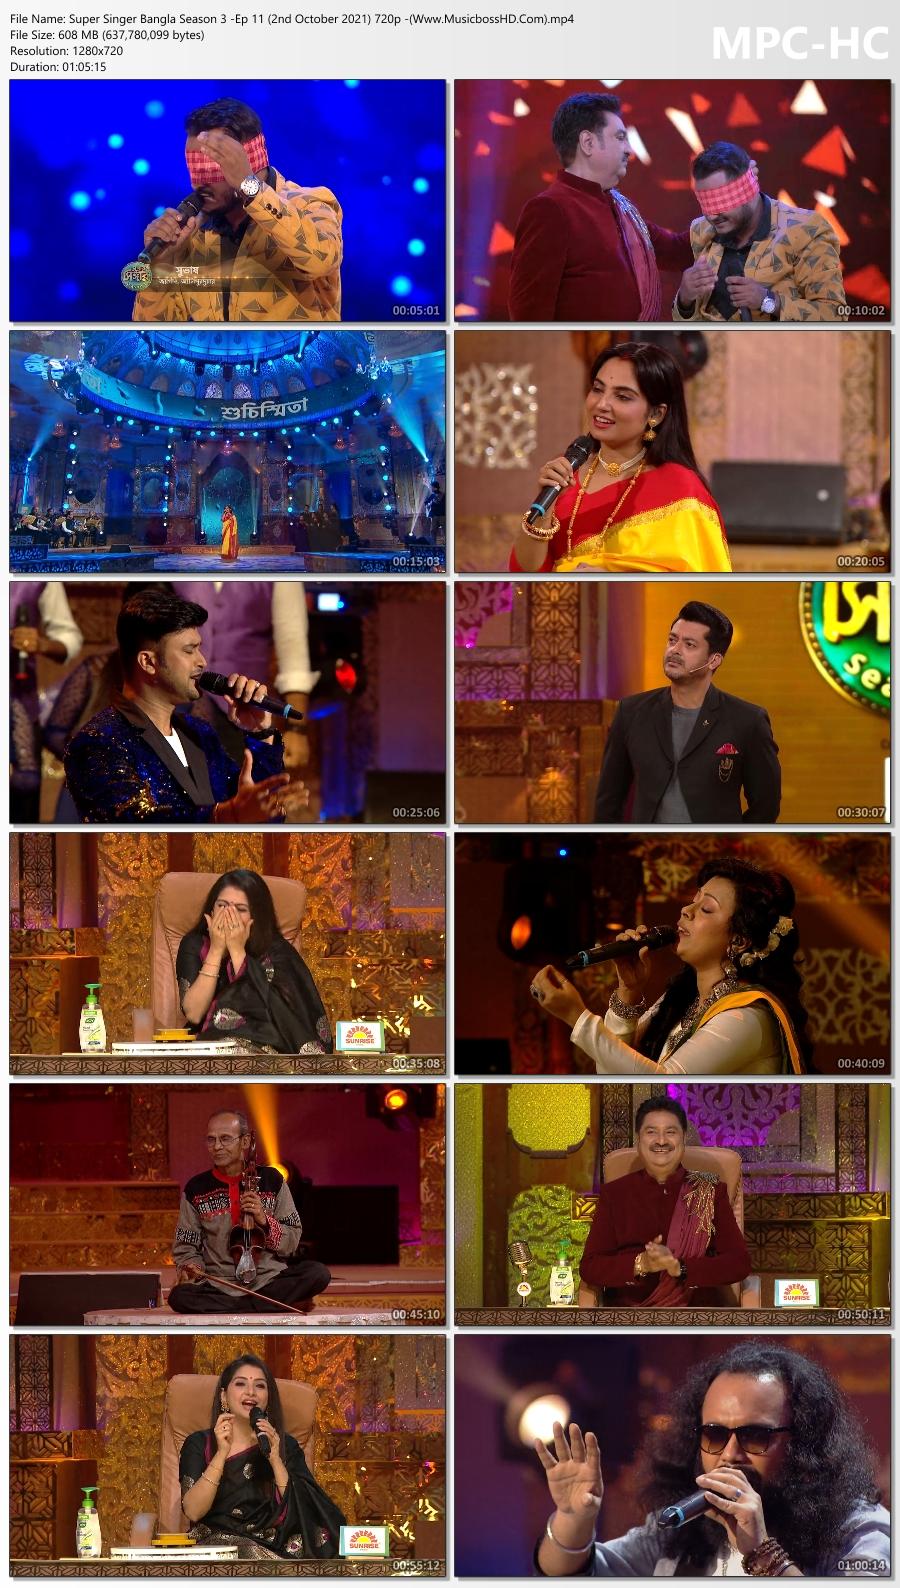 Super-Singer-Bangla-Season-3-Ep-11-2nd-October-2021-720p-Www-Musicboss-HD-Com-mp4-thumbs